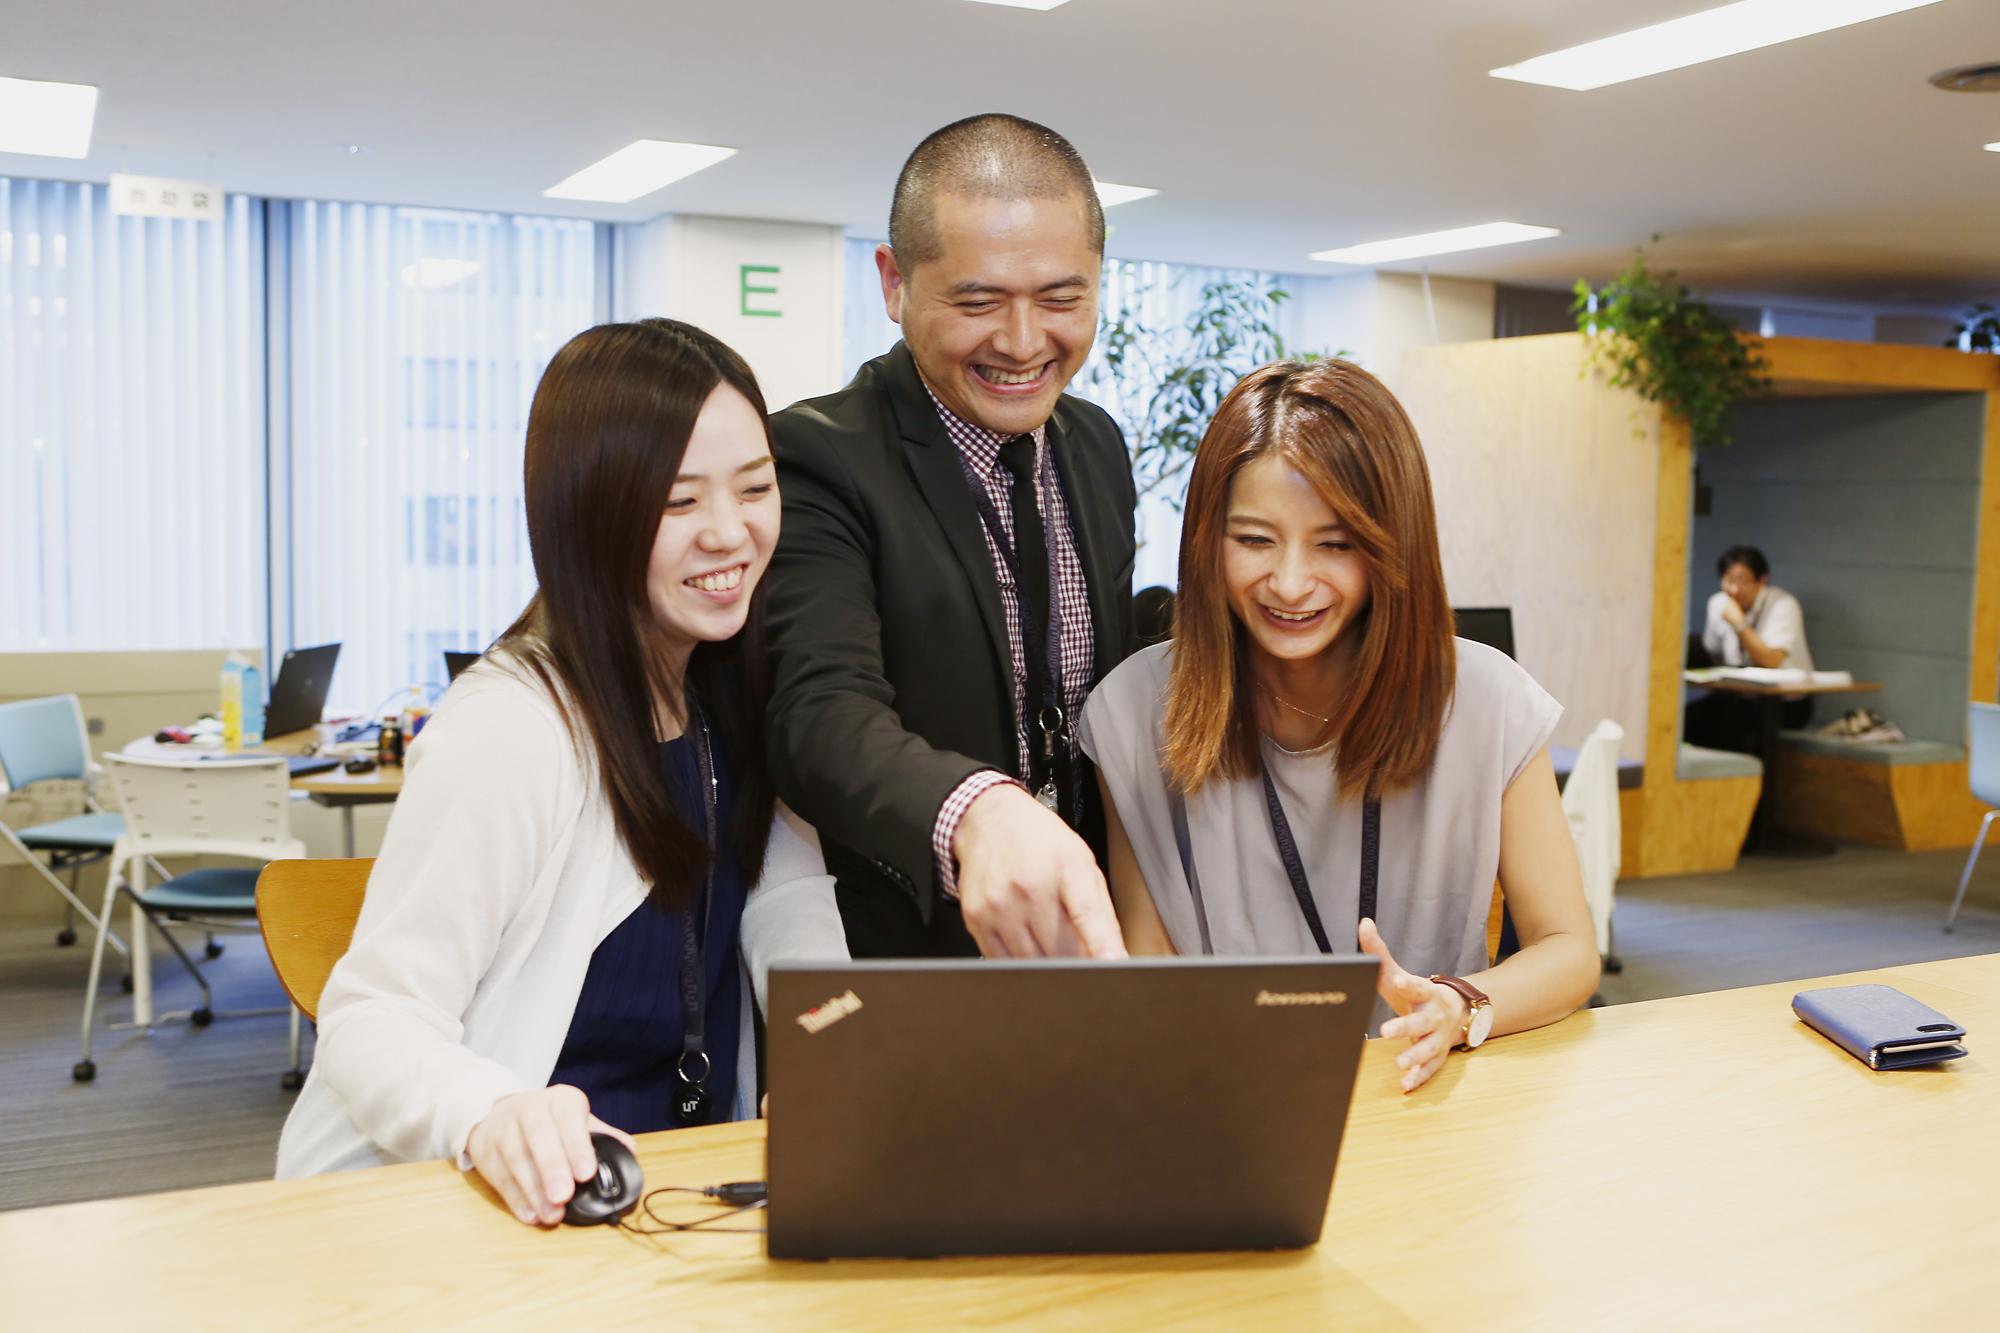 JEEK経由での応募学生は特別選考フローへご招待!